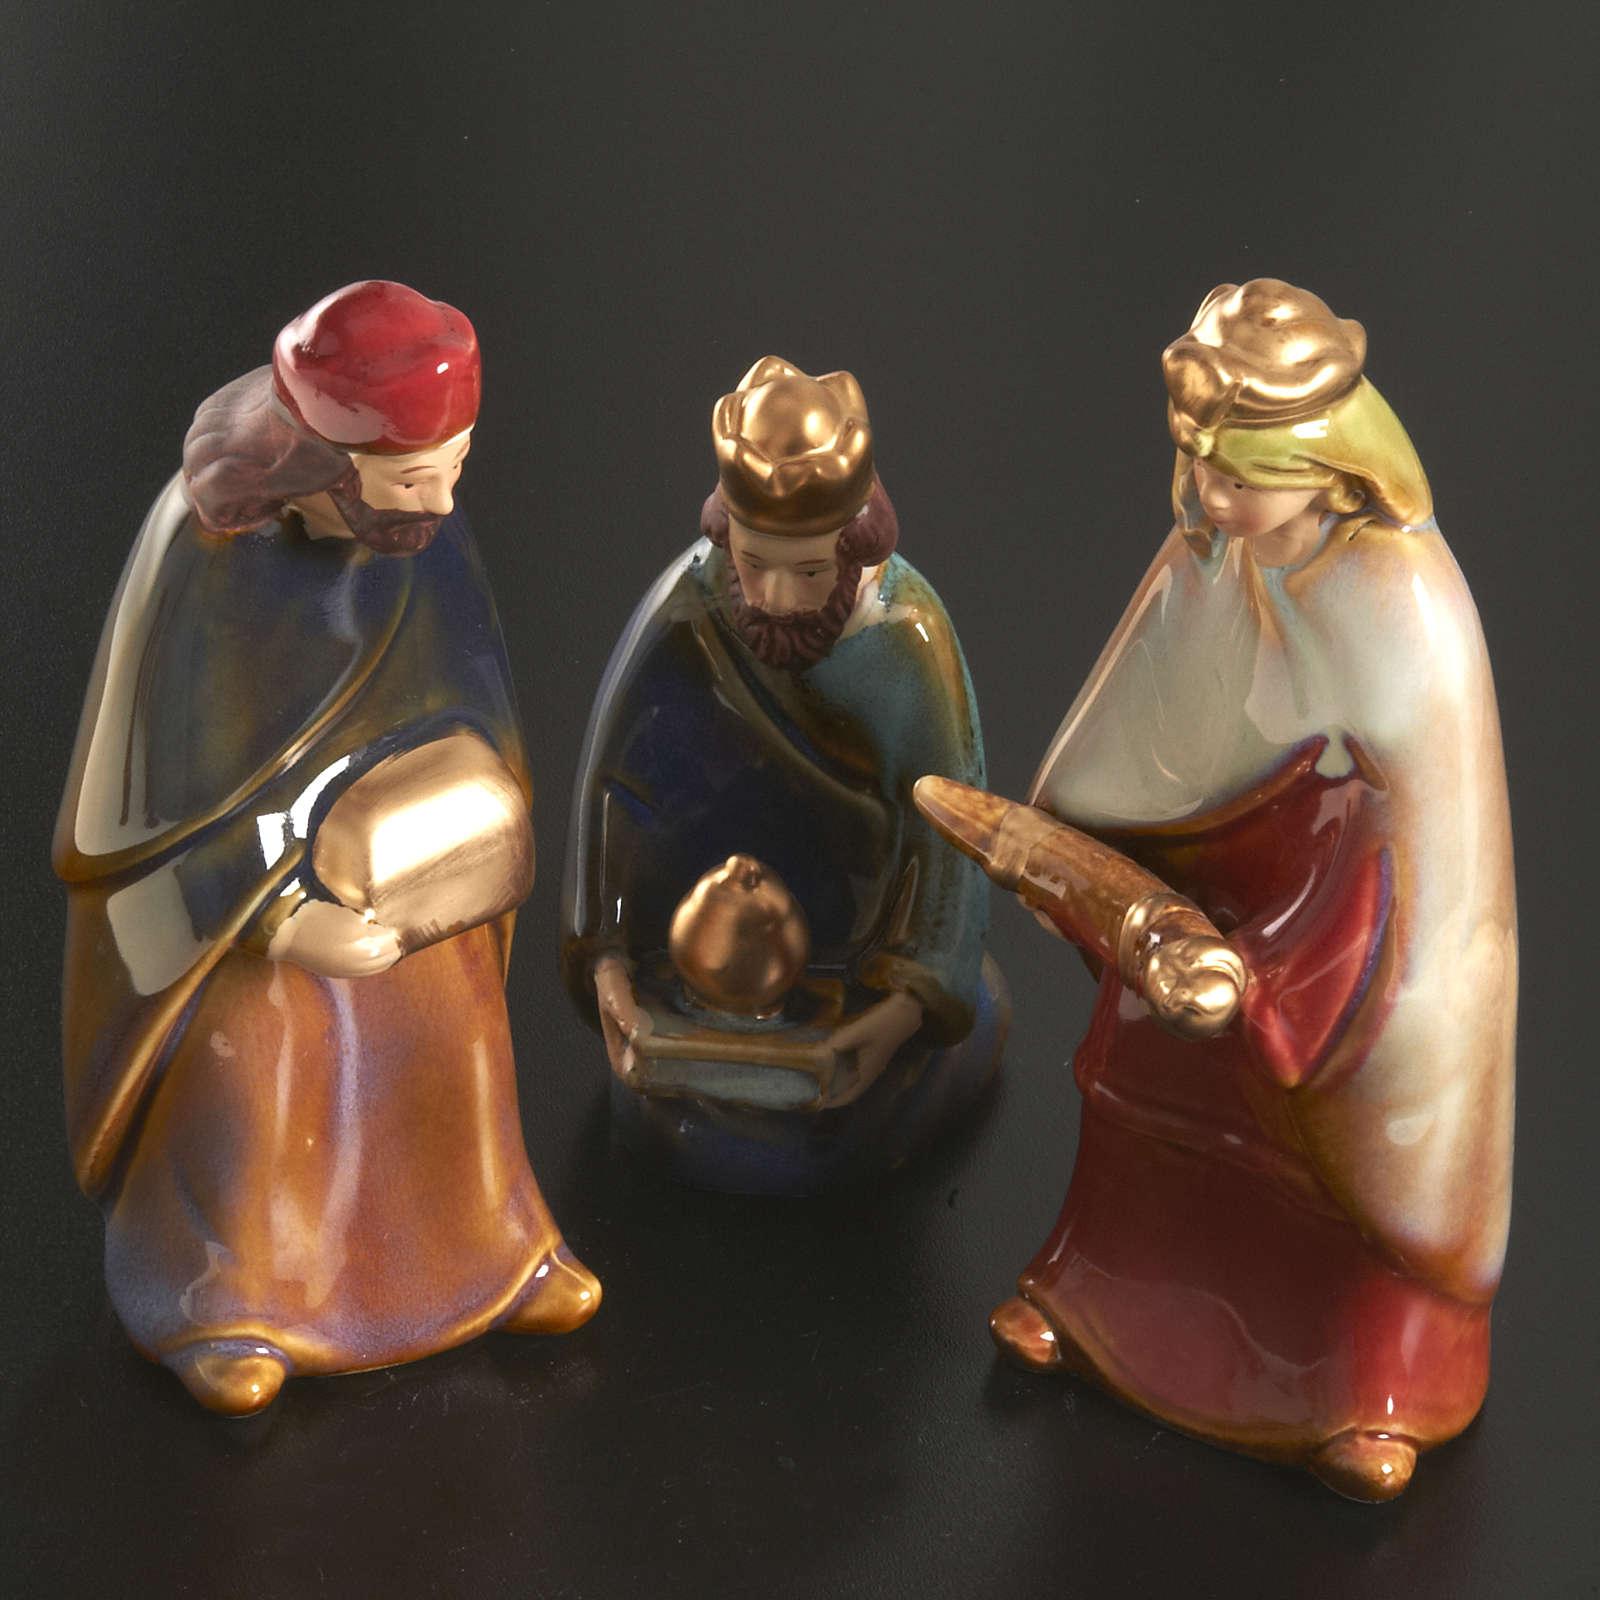 Presepe completo ceramica 11 statue 15 cm 4